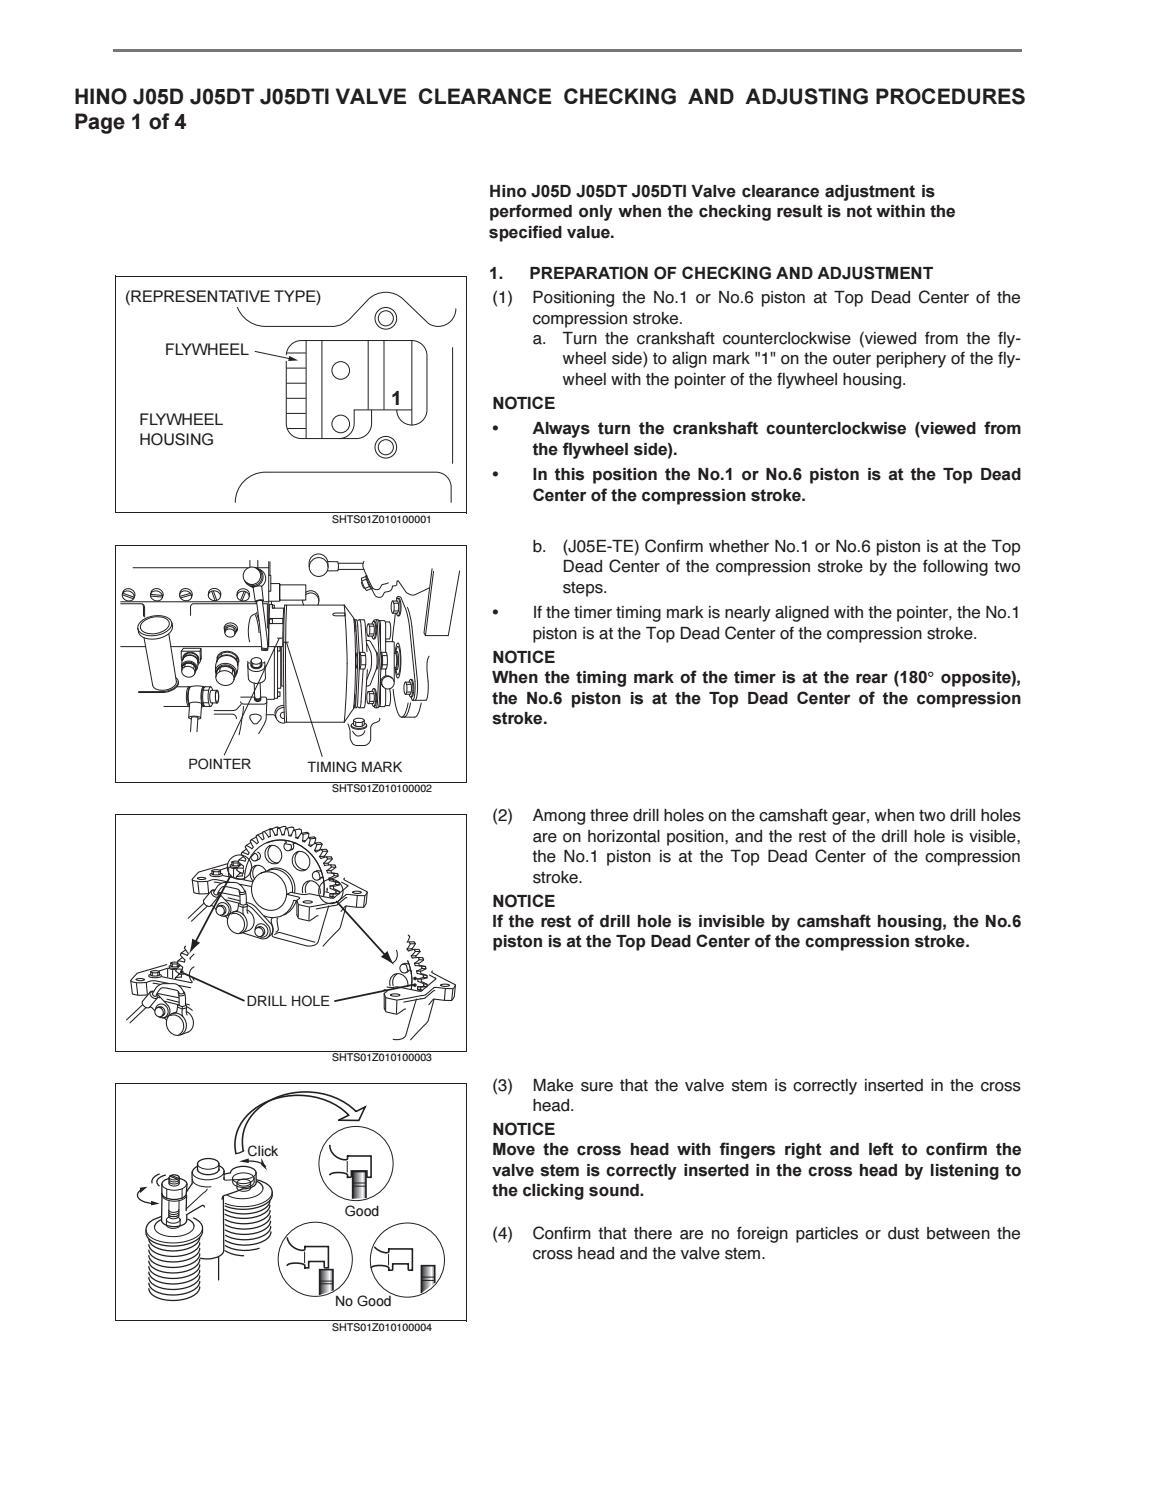 Hino J05D J05DT J05DTI Engine Valve Adjustment Procedure